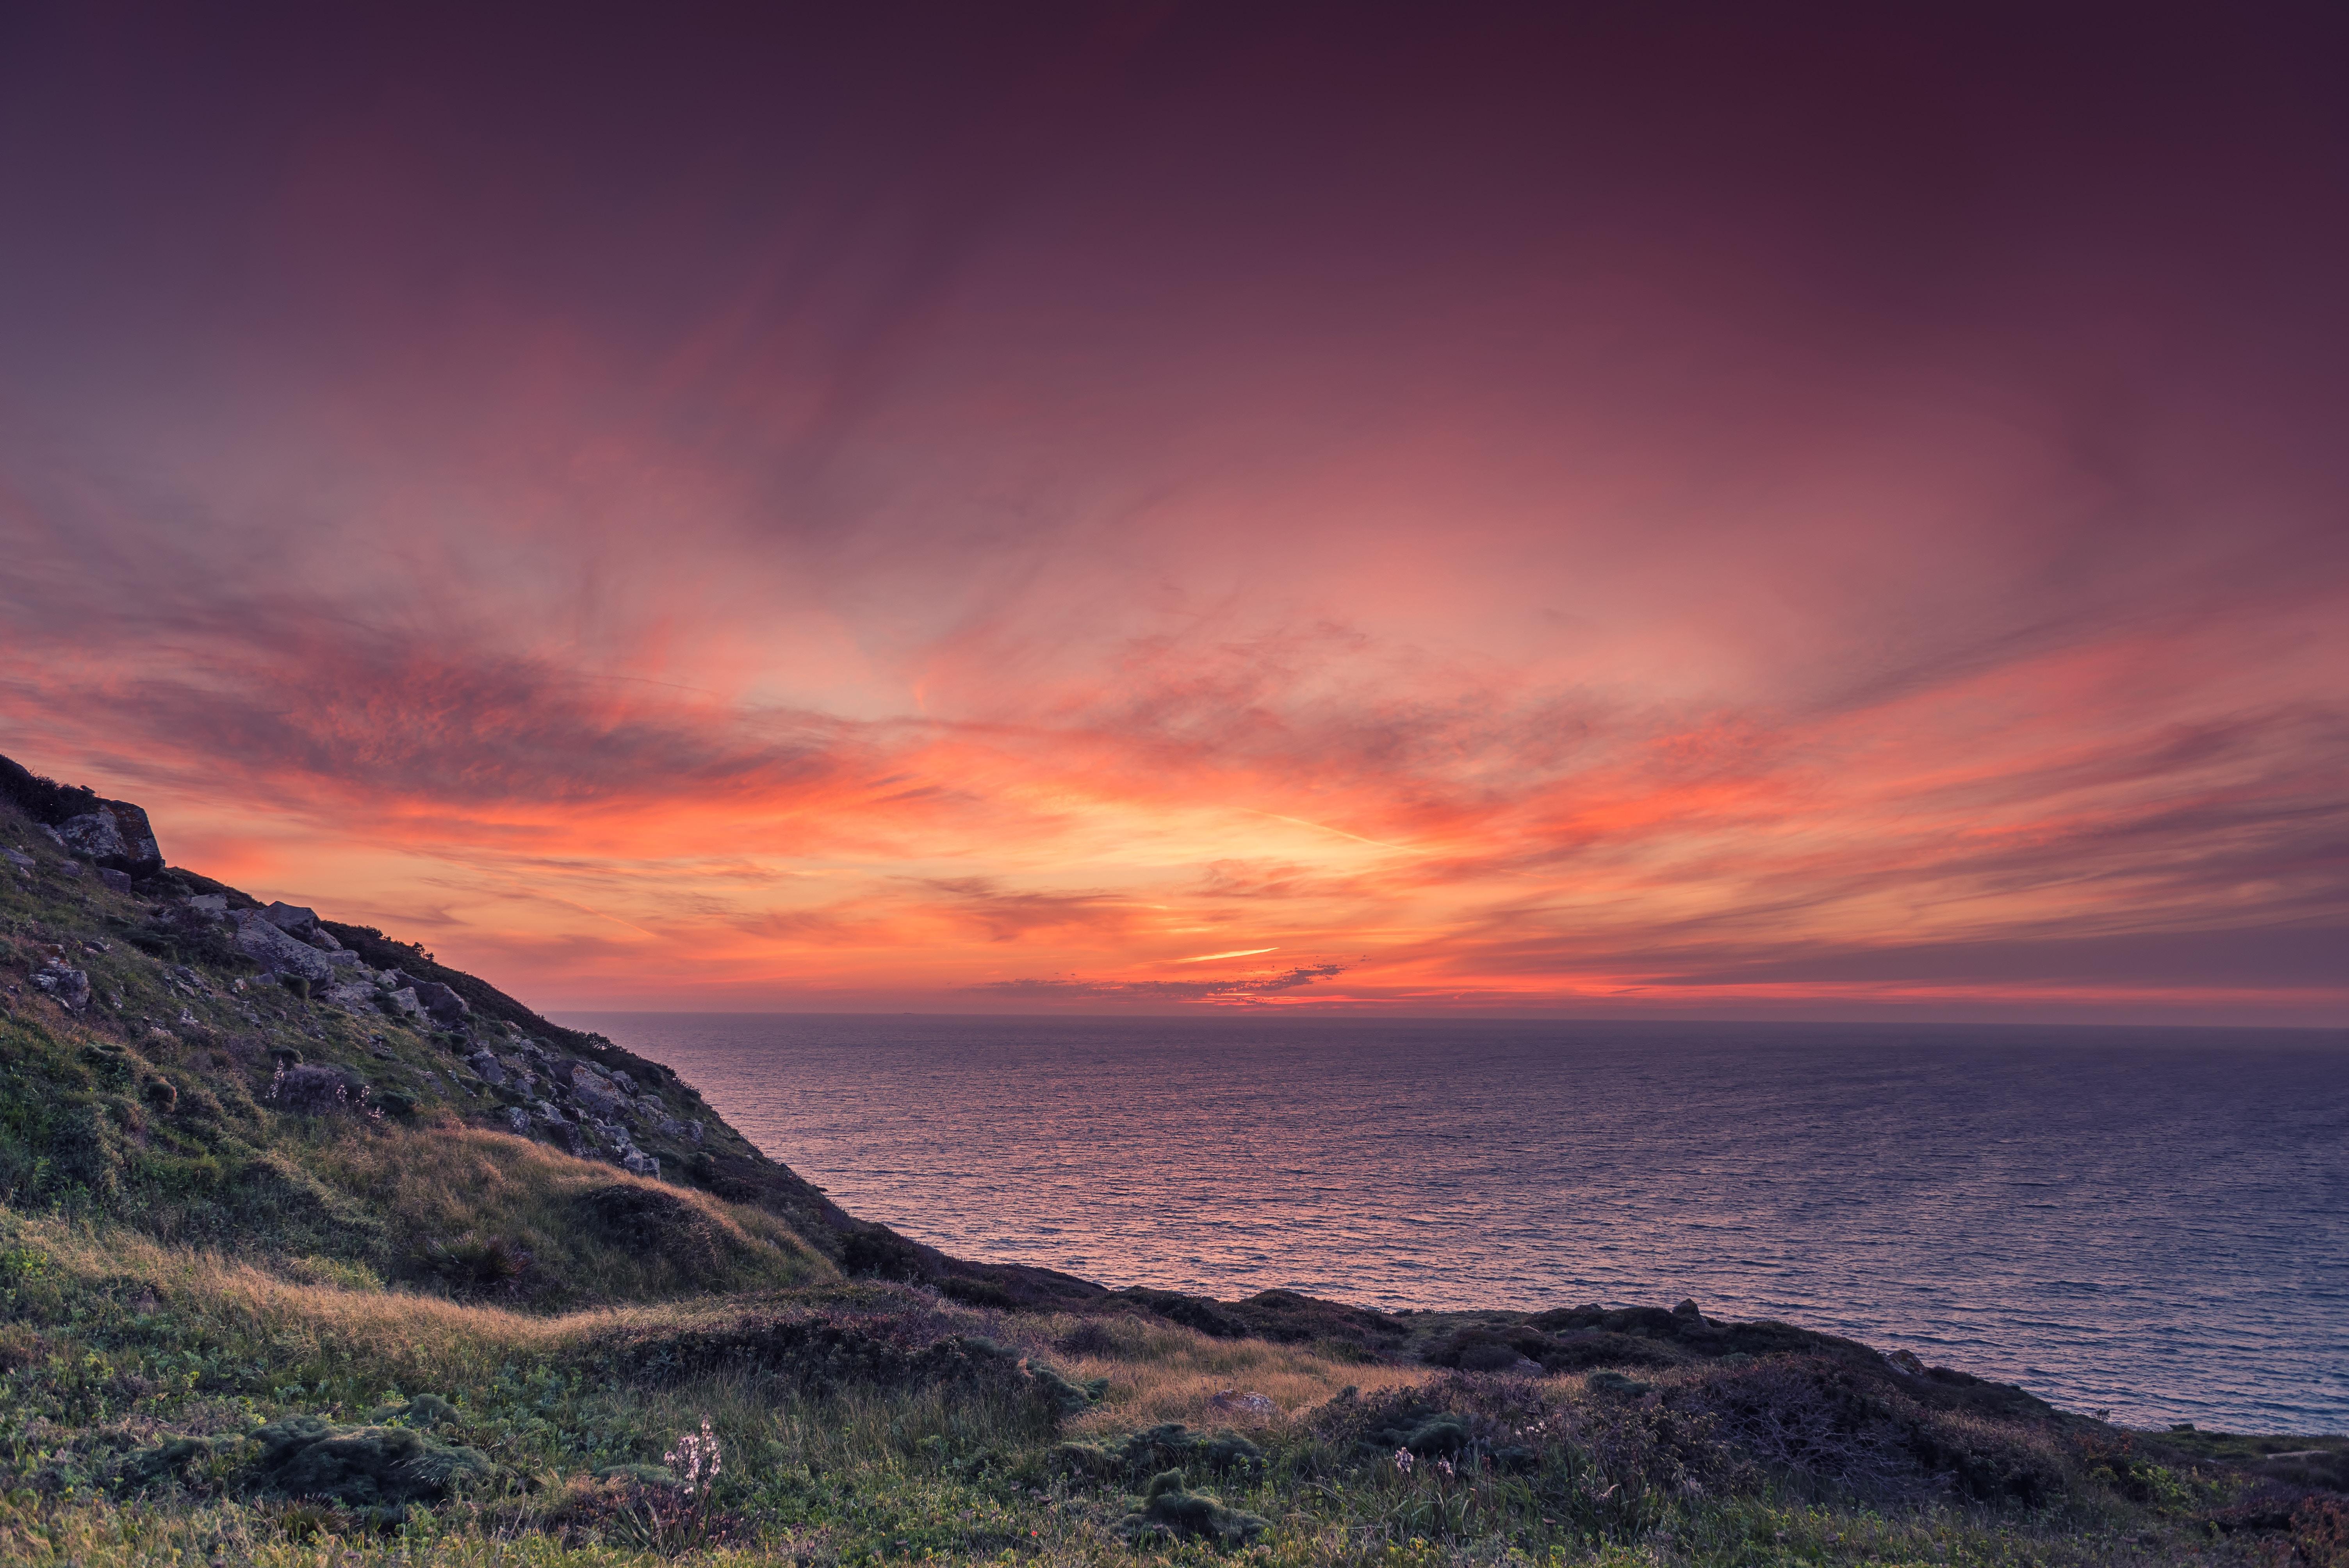 The sunset in Sardinia